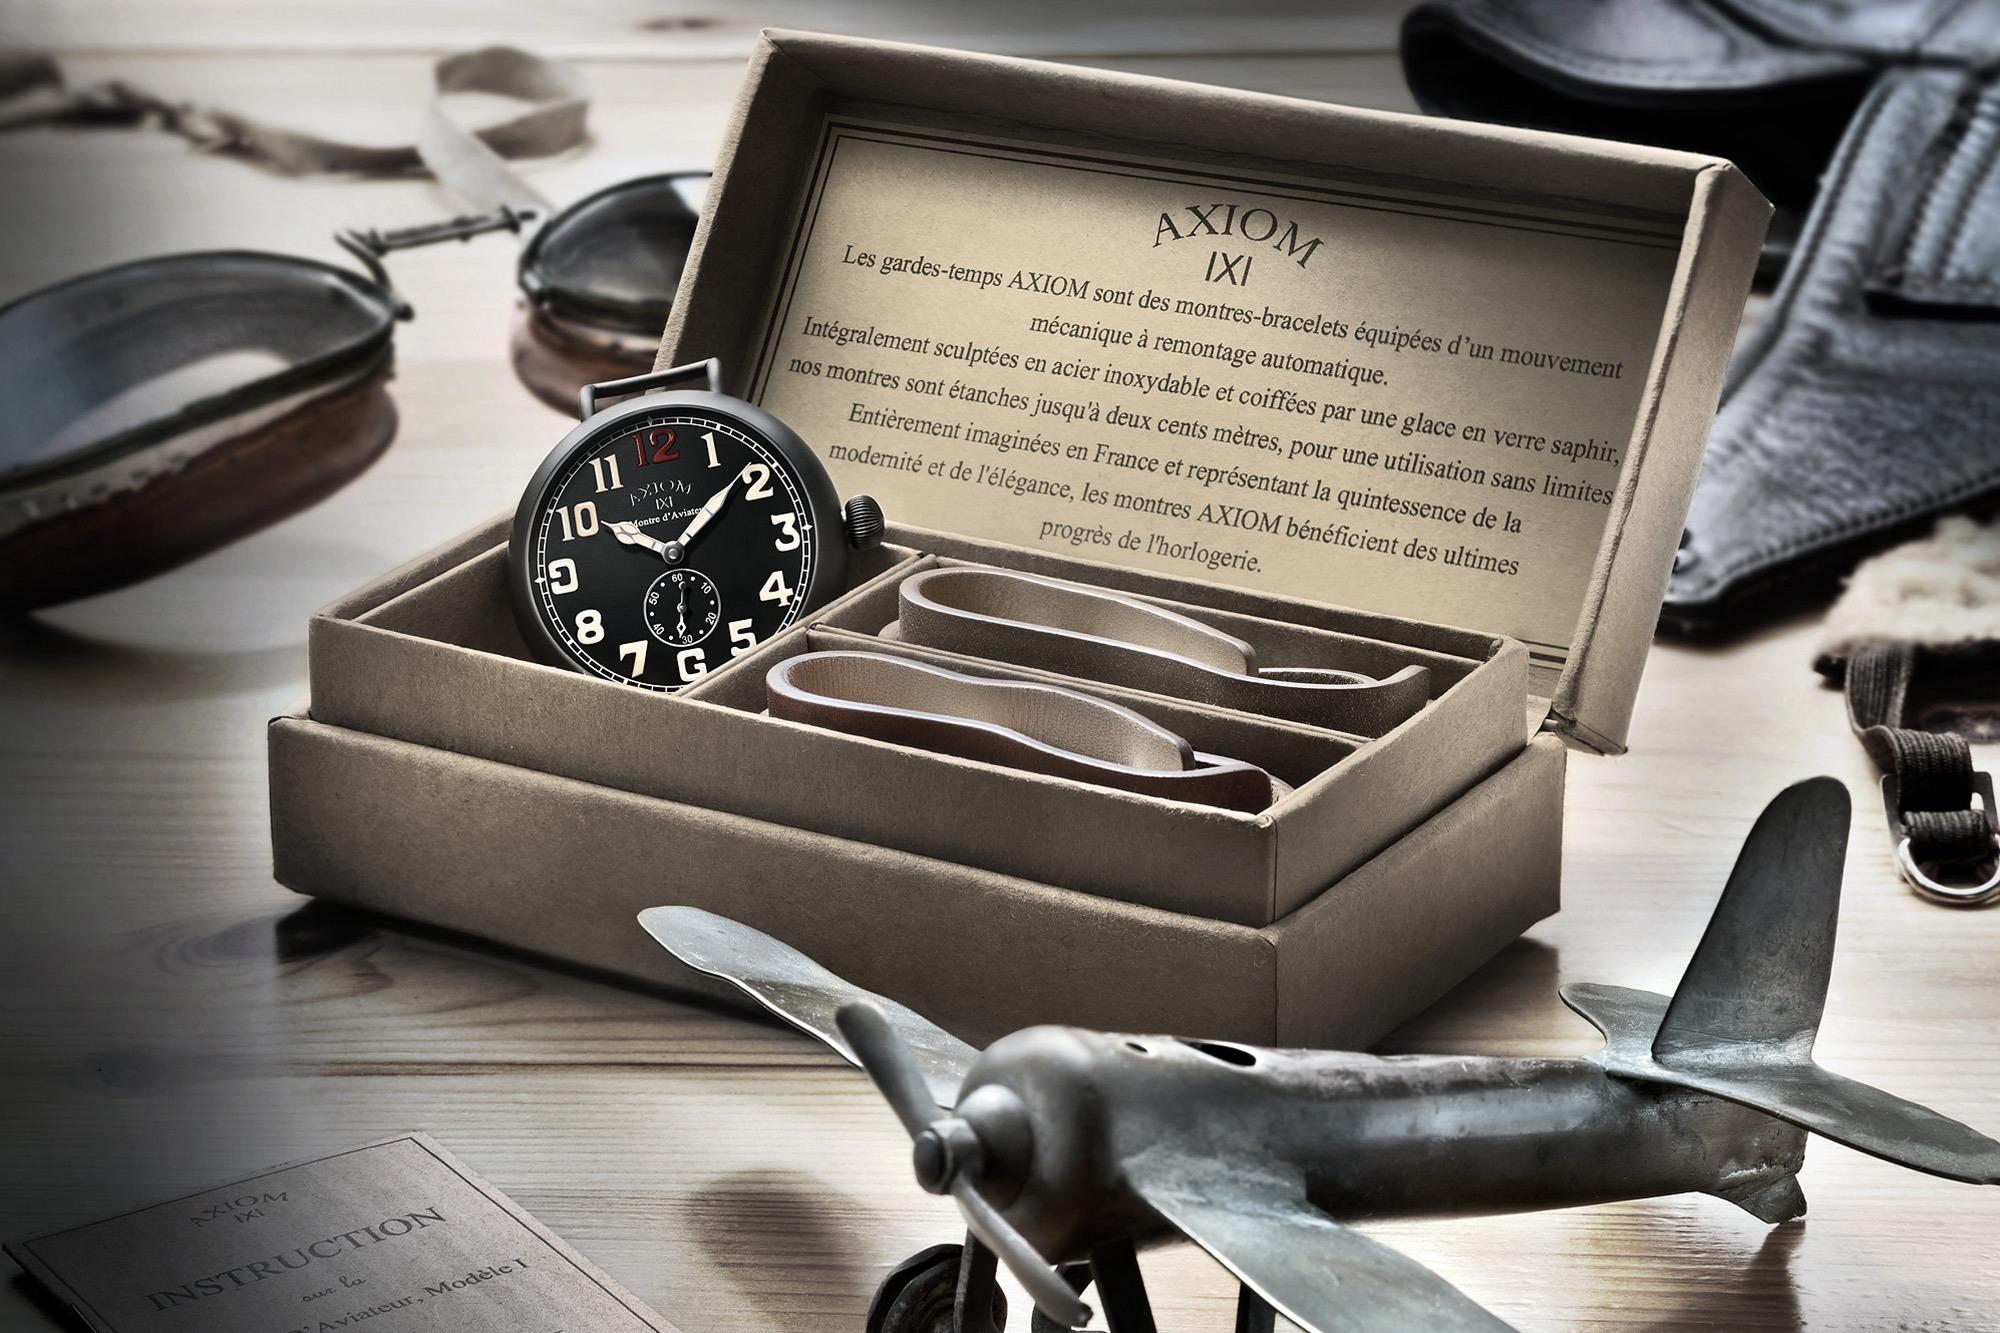 Axiom Montre d'Aviateur I - Boite en carton